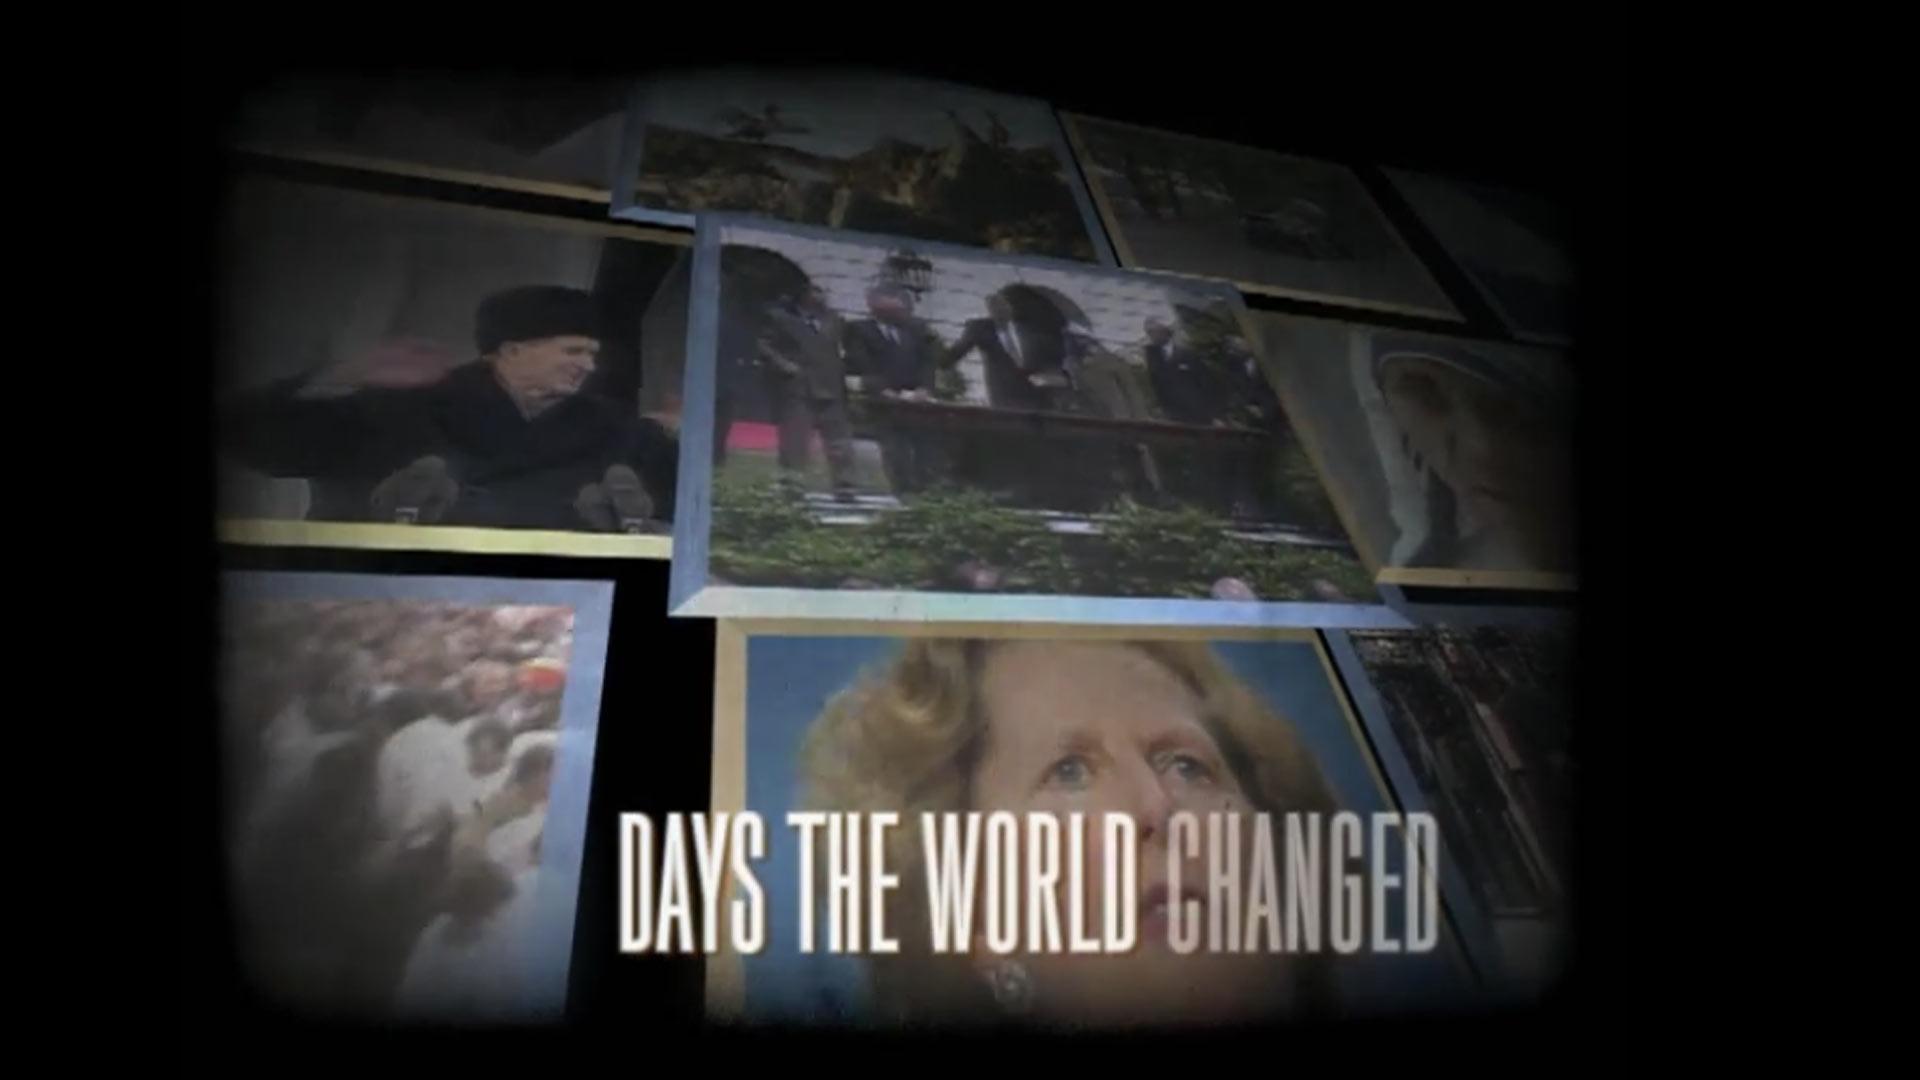 "Watch Full Movie - ימים ששינו את העולם - גירושי הנסיך מווילס והנסיכה דיאנה, כשלון הפיכה בבריה""מ ועוד"